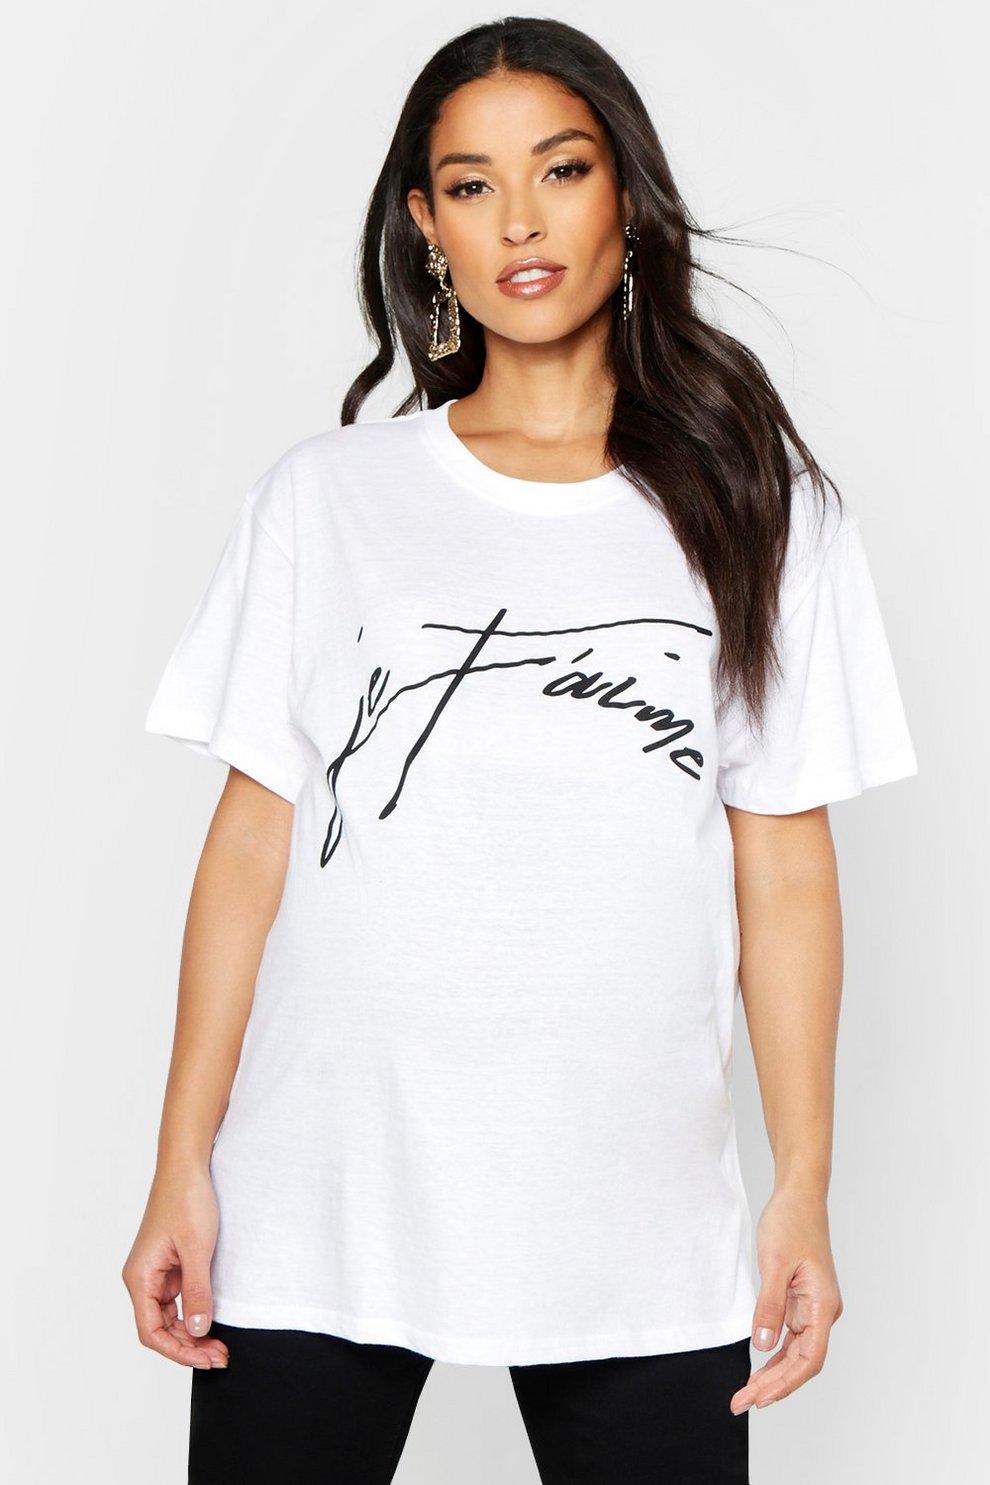 757f50c61 Camiseta con eslogan Je T aime premamá